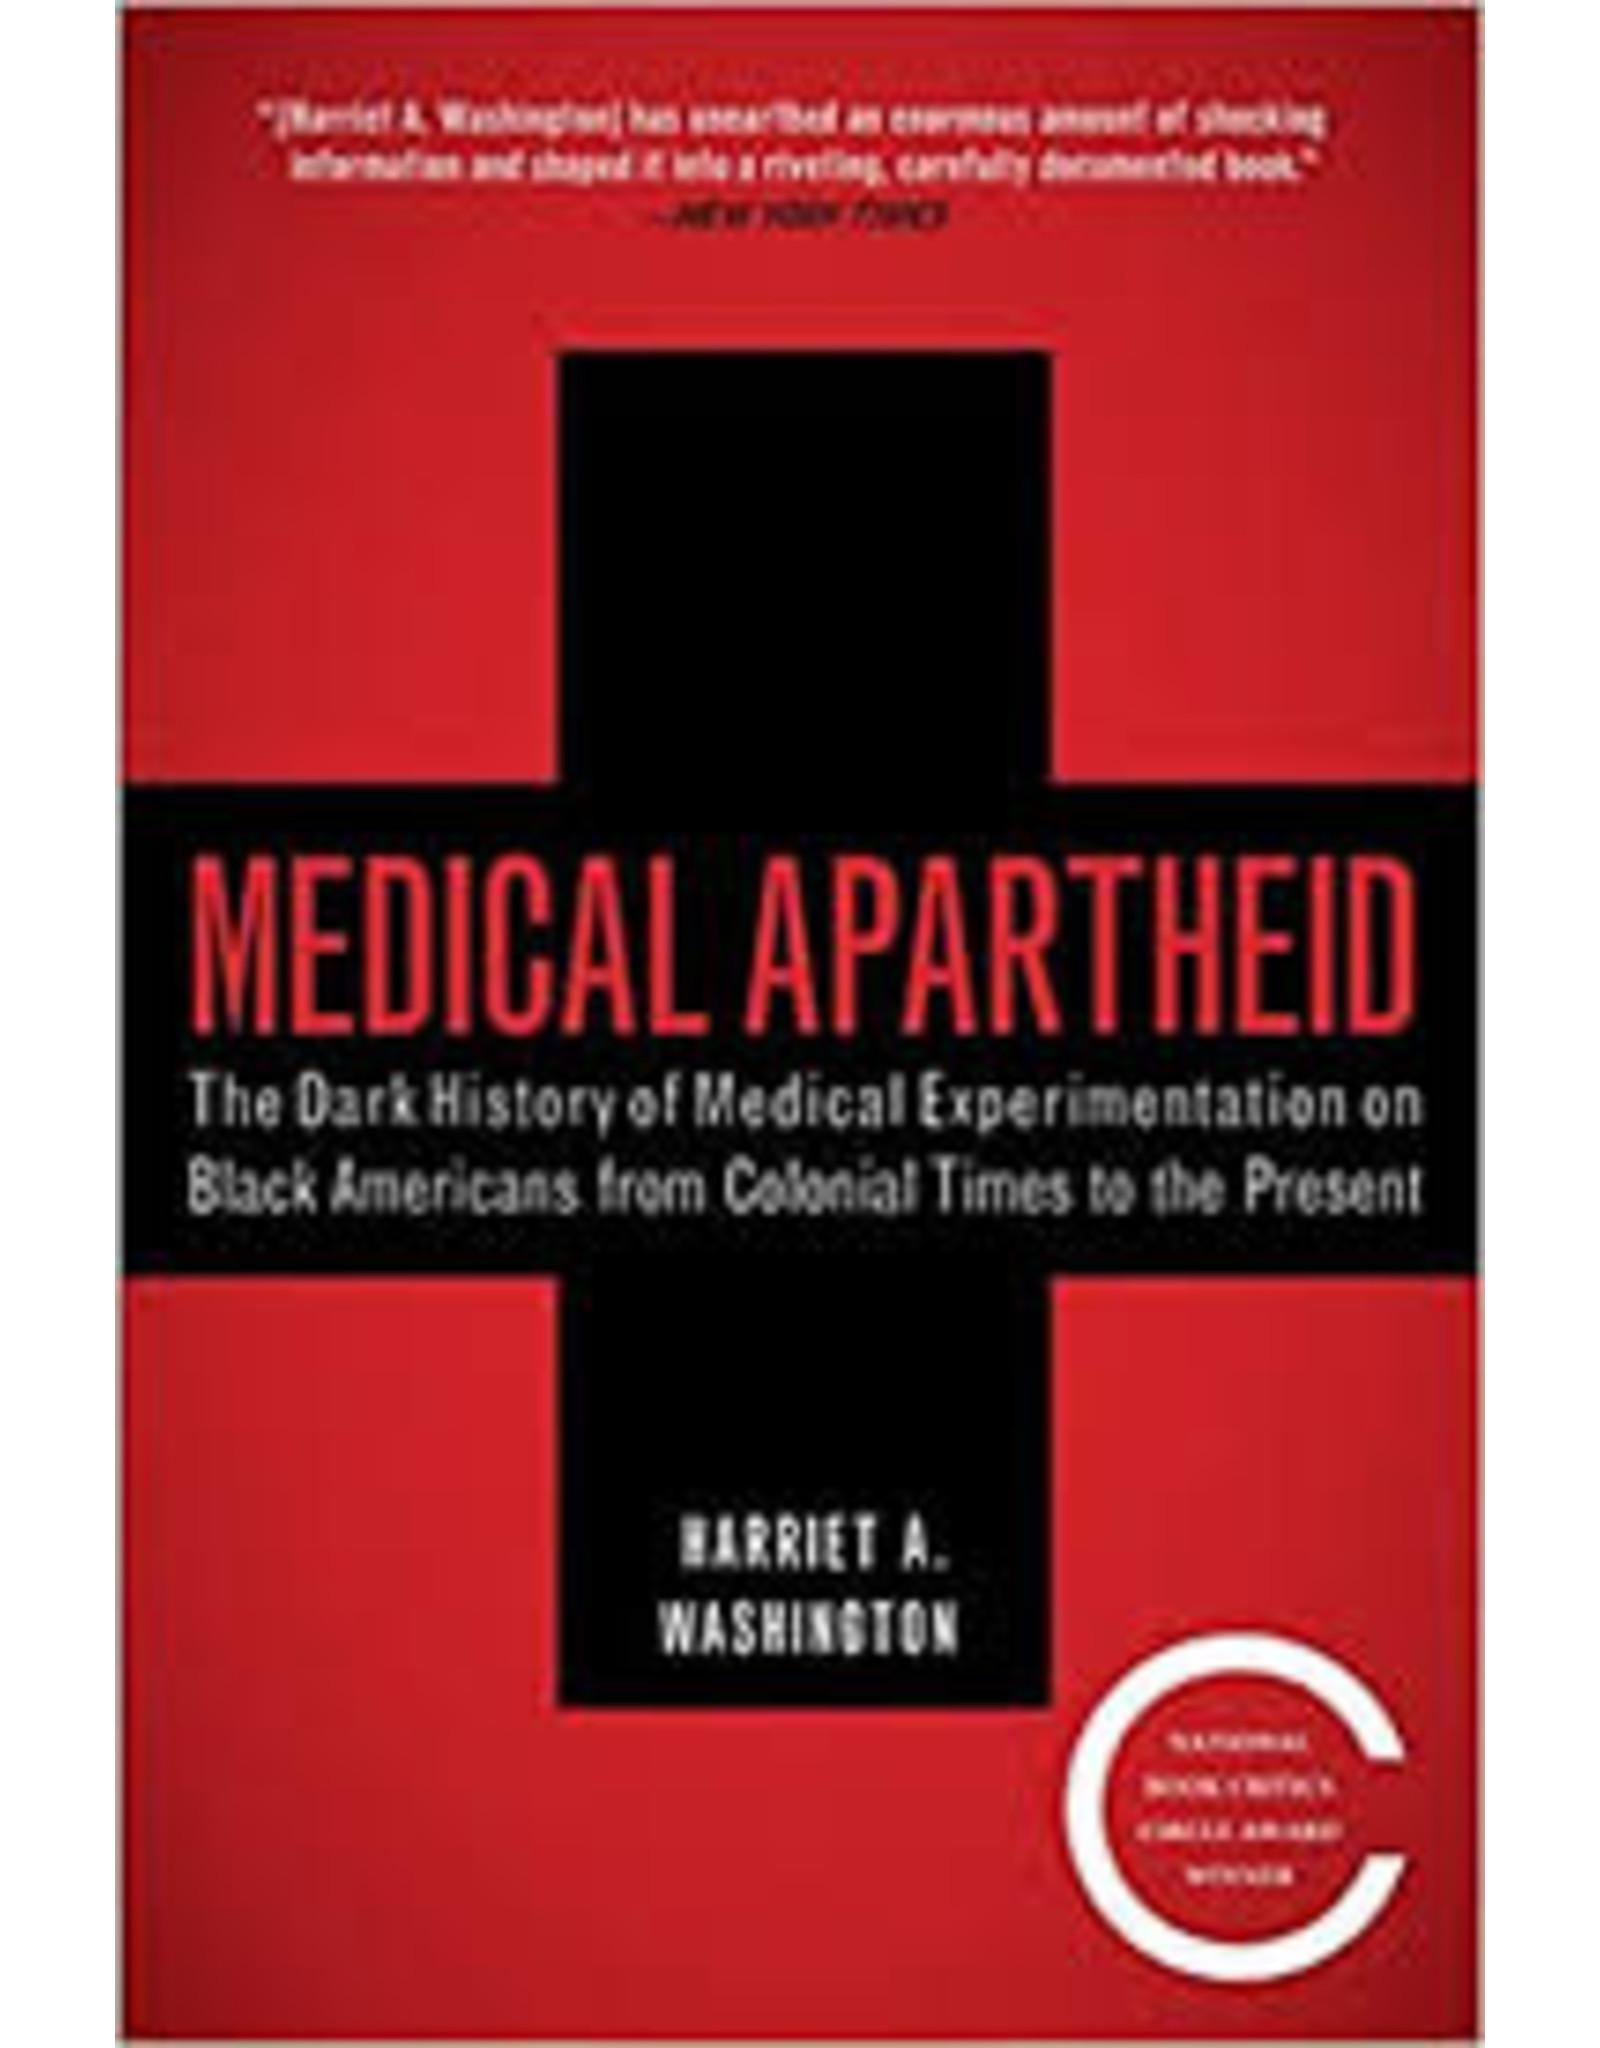 Books Medical Apartheid by Harriet A Washington